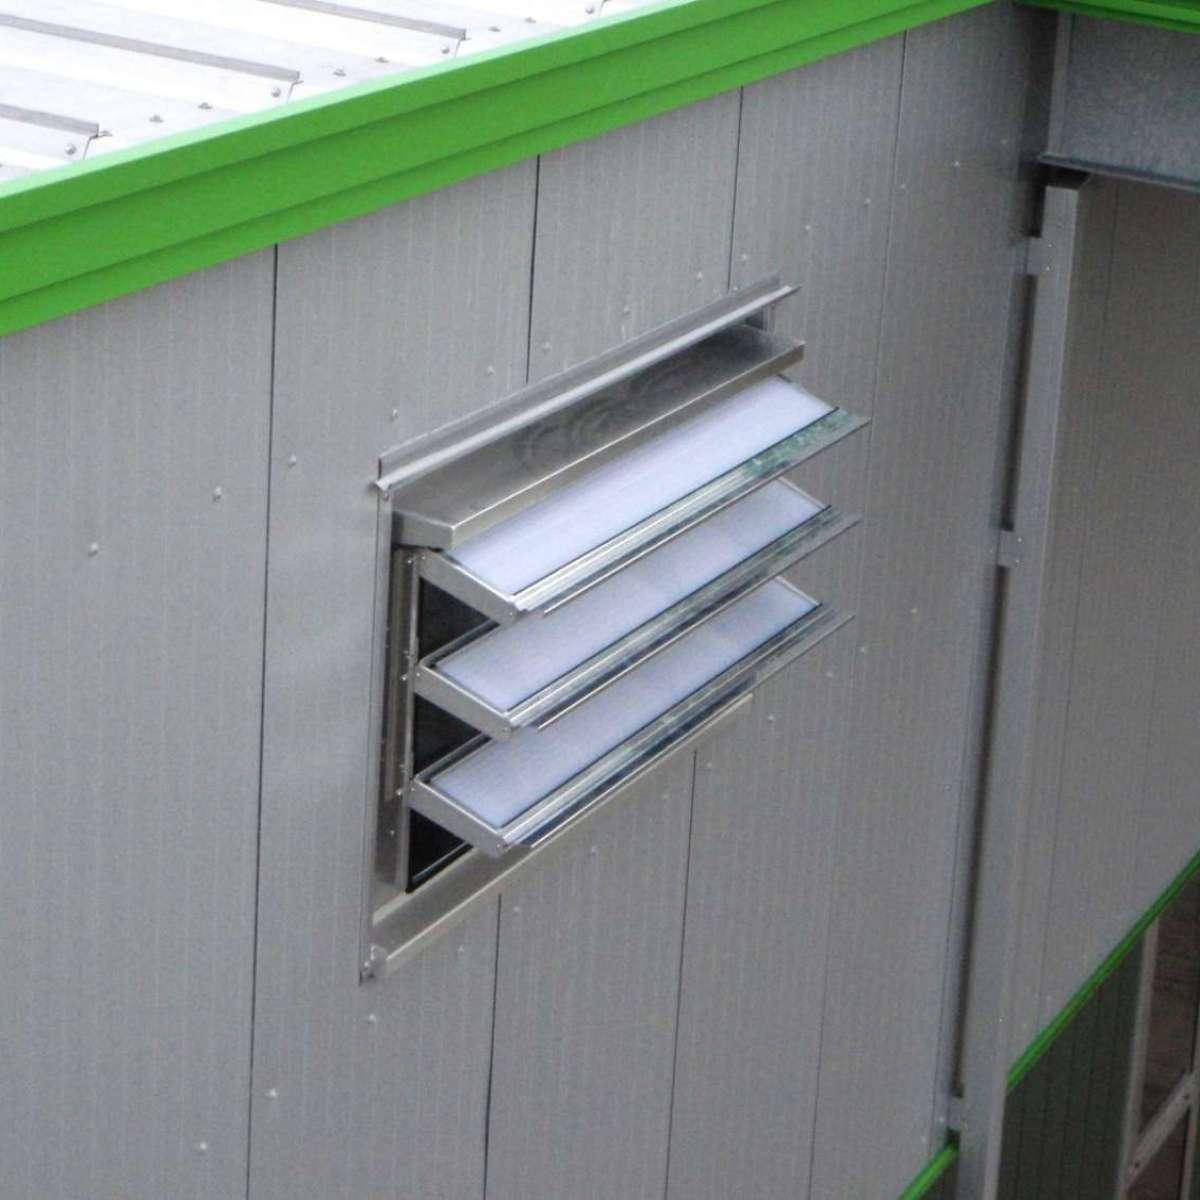 INDU LIGHT | LLP louvered ventilator • Image 1